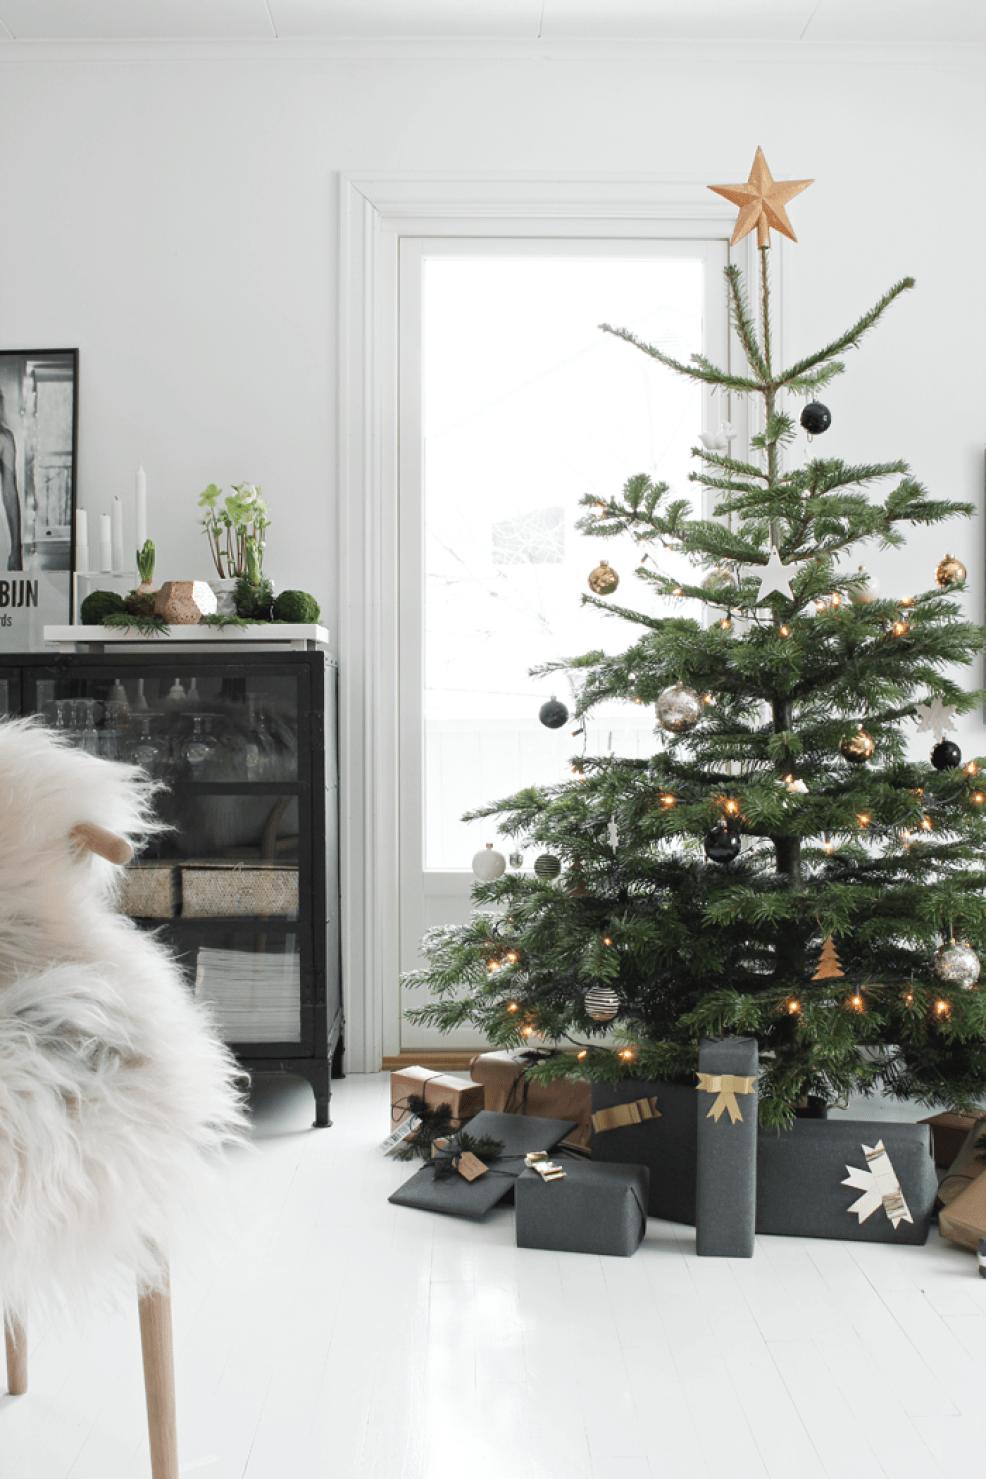 celebrar la Navidad - árbol nórdico